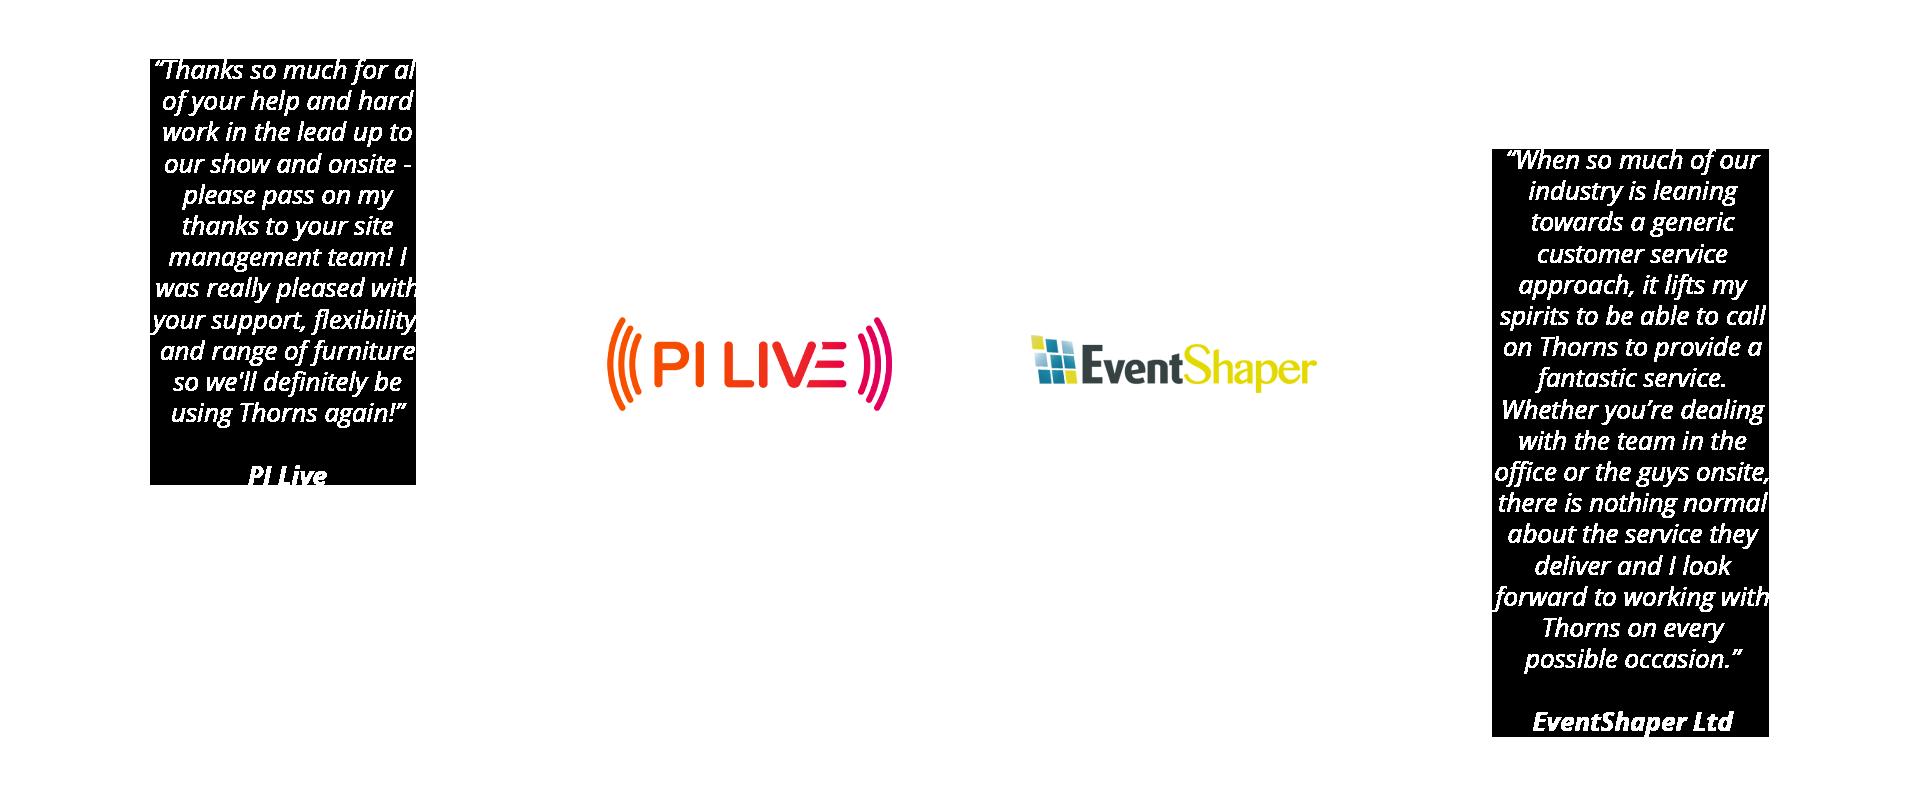 PI Live and Event Shaper Testimonials